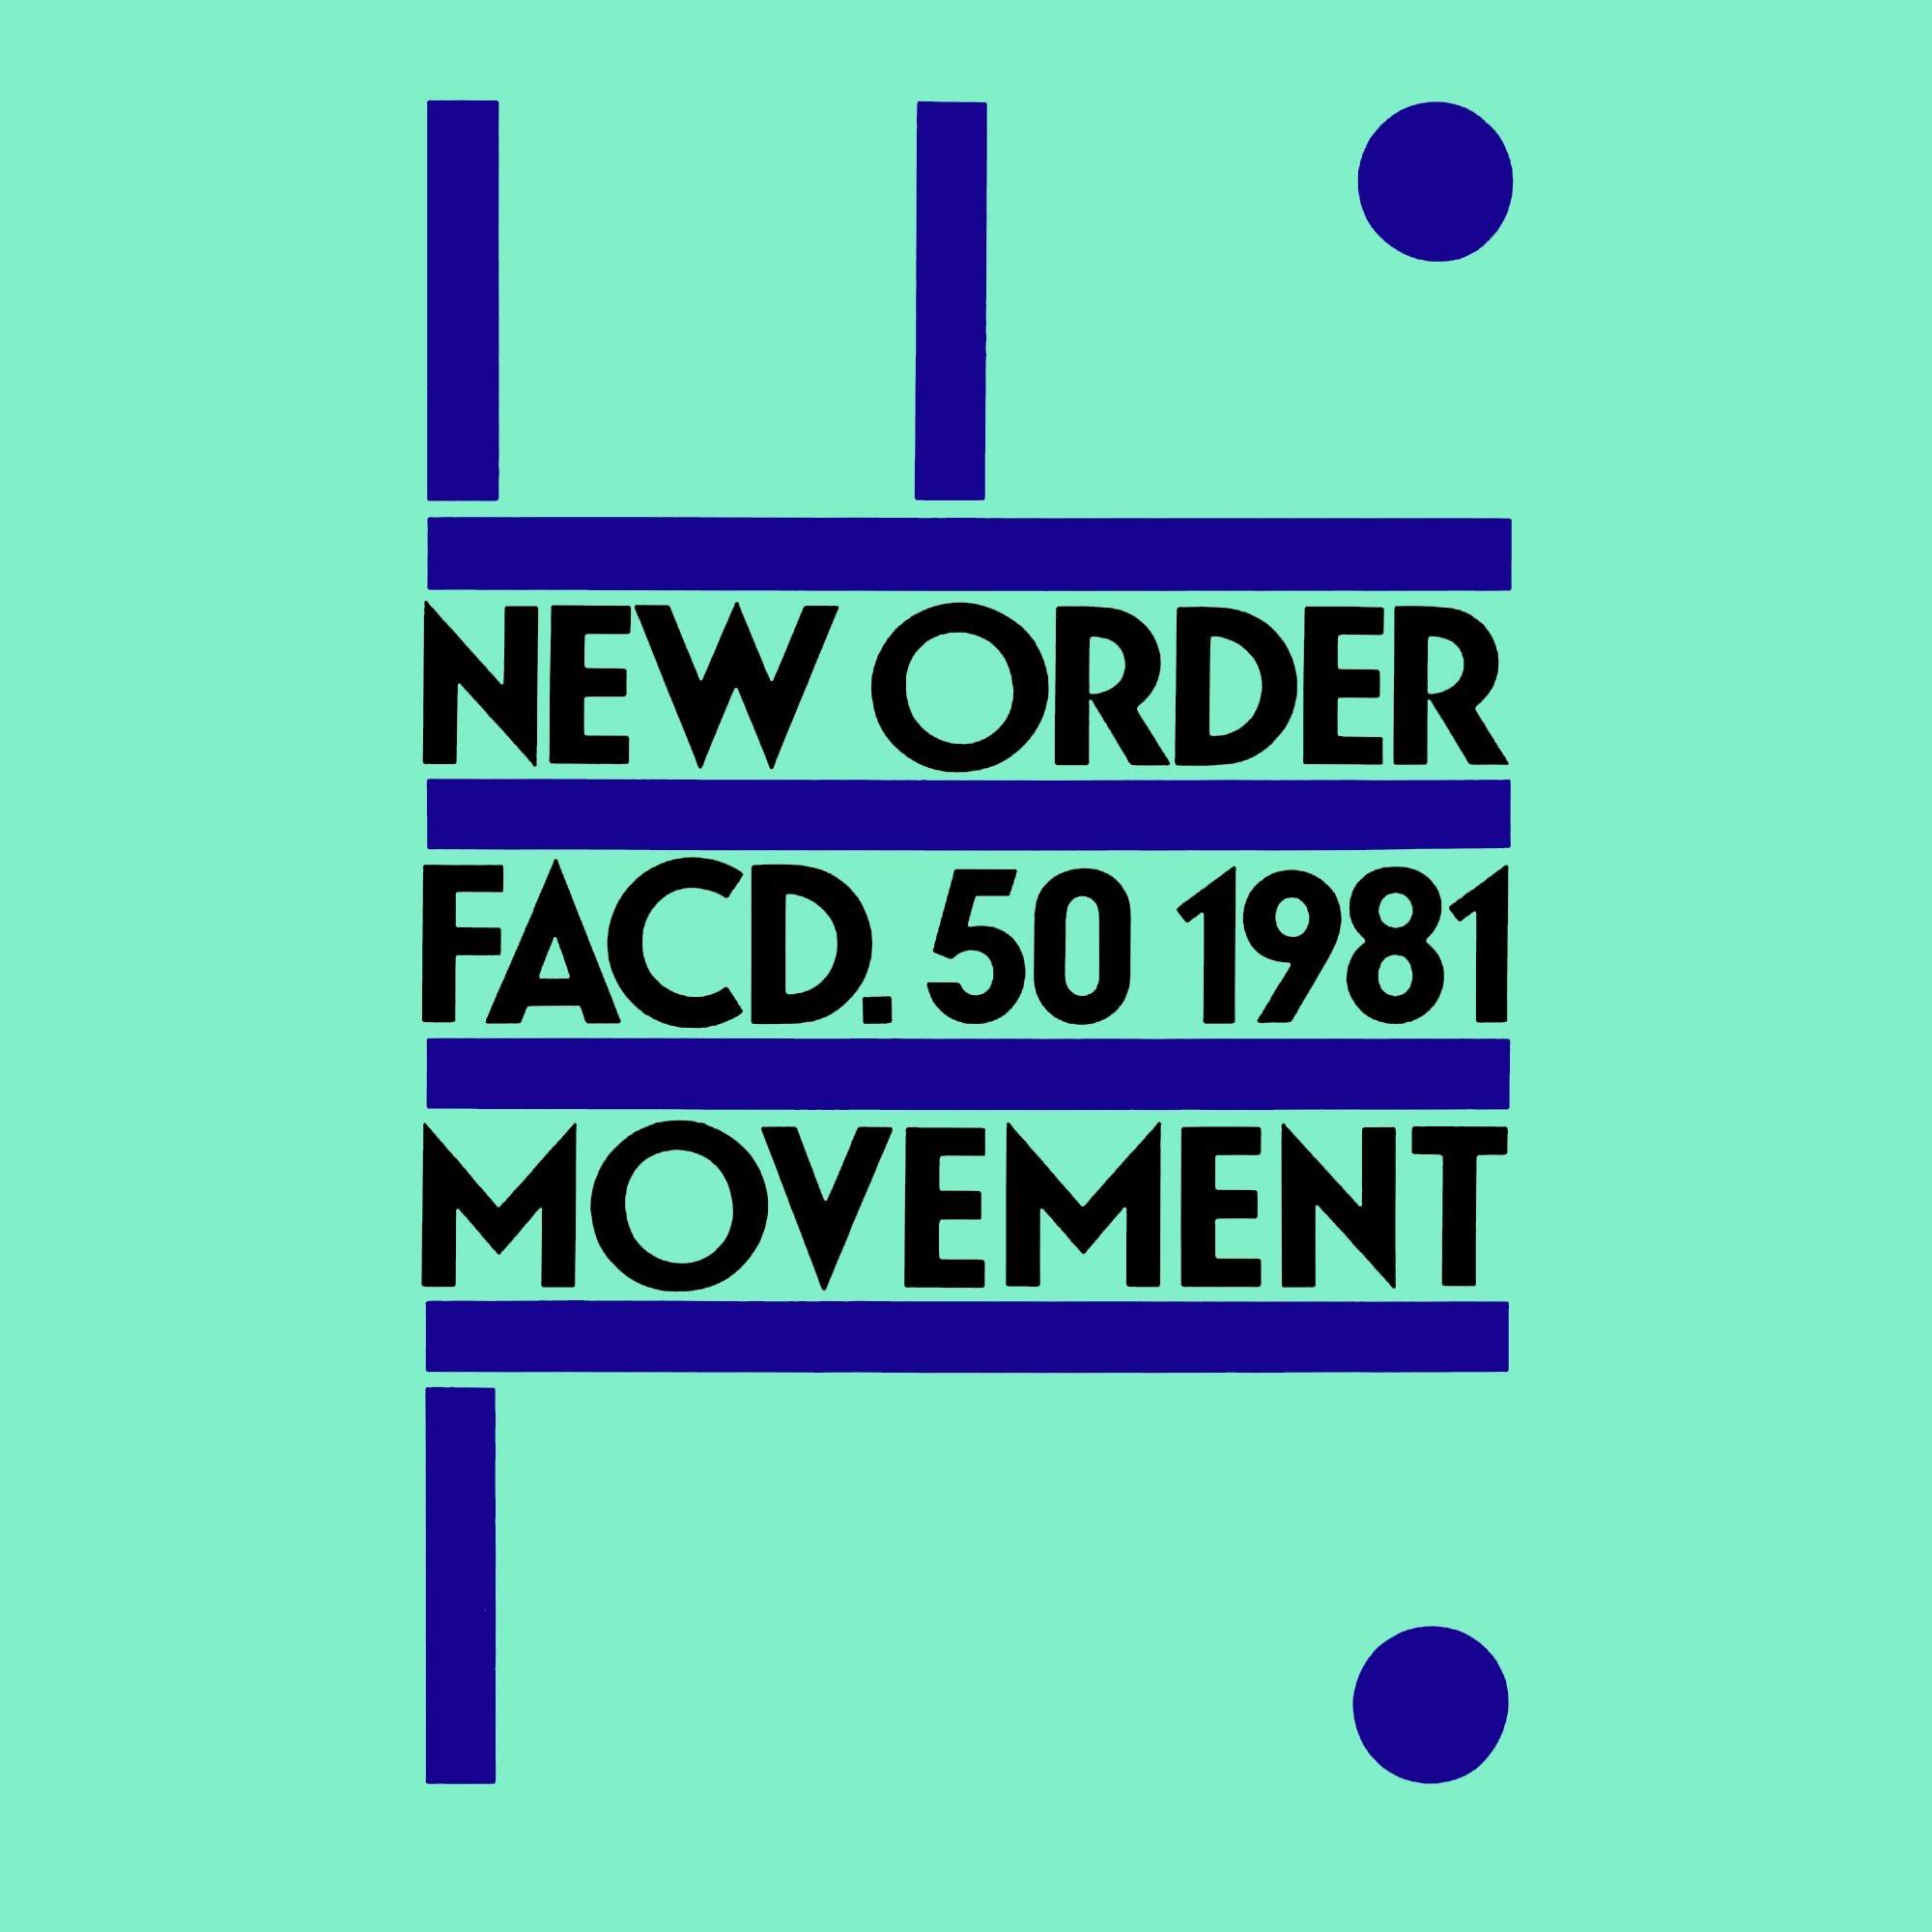 New Order - Movement Vinyl Record